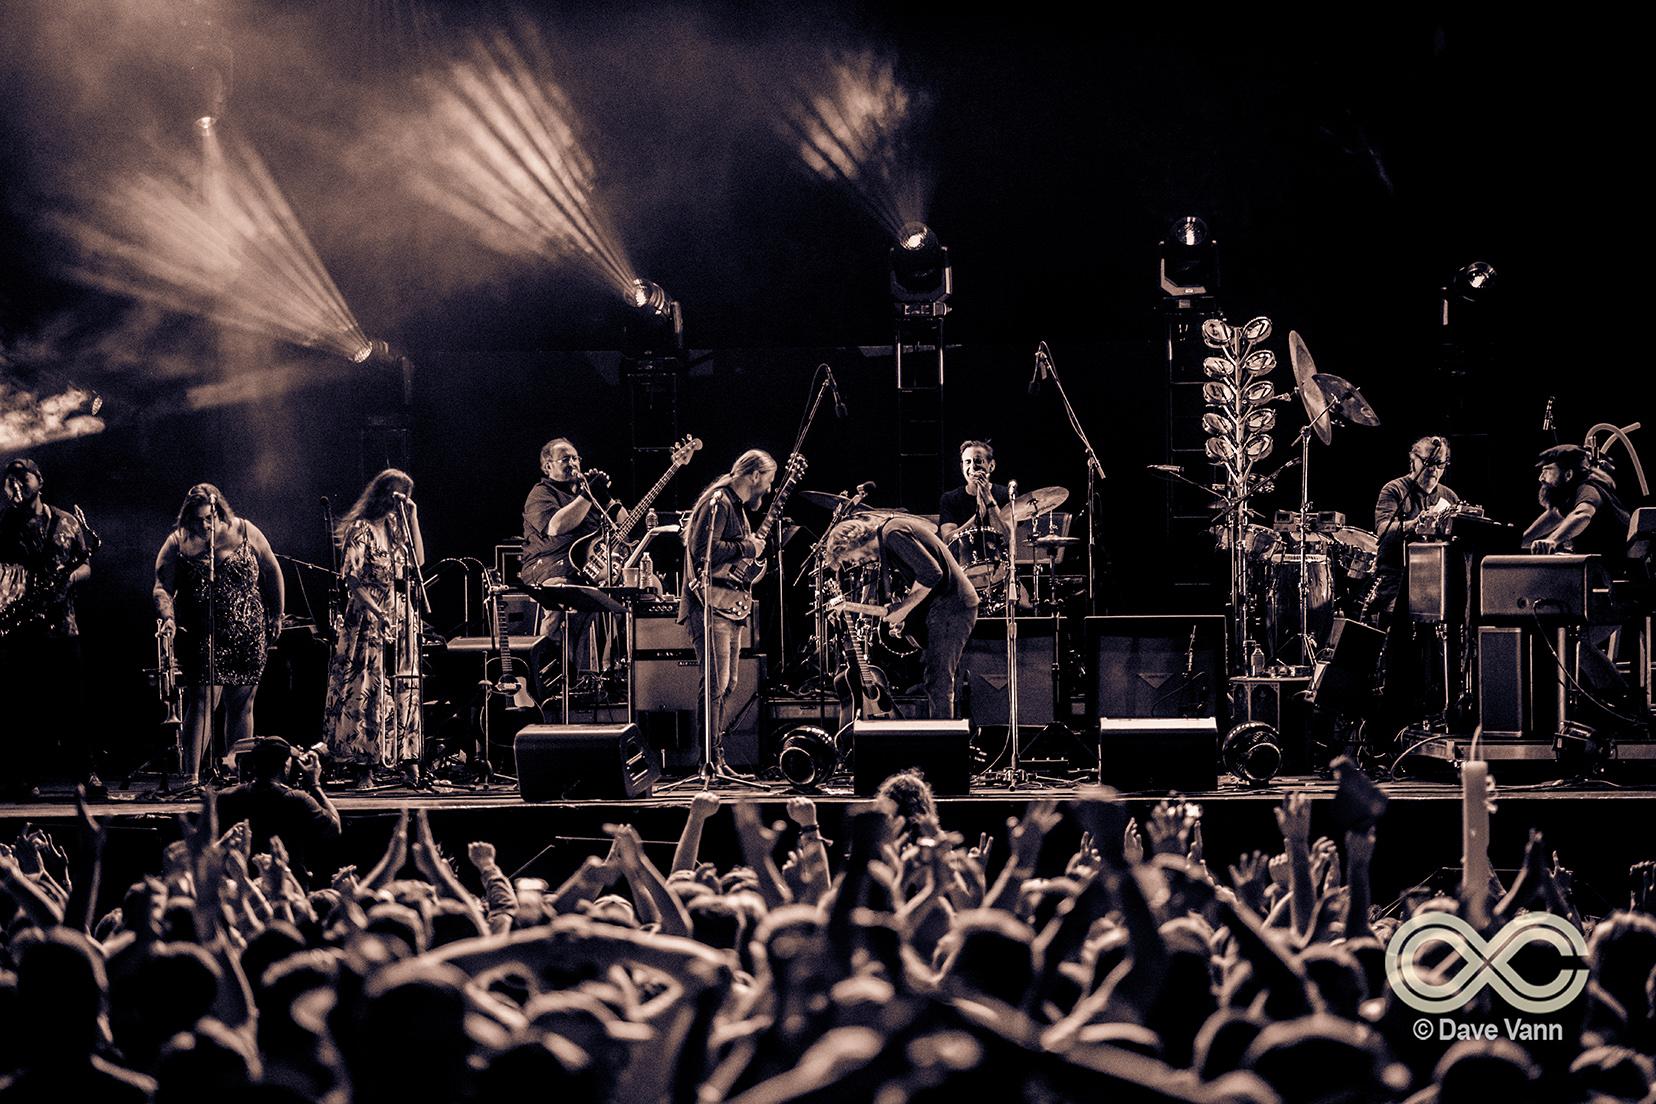 Trey Anastasio At LOCKN' 2019: 3 Bands, 4 Sets, Endless Memories [Photos]